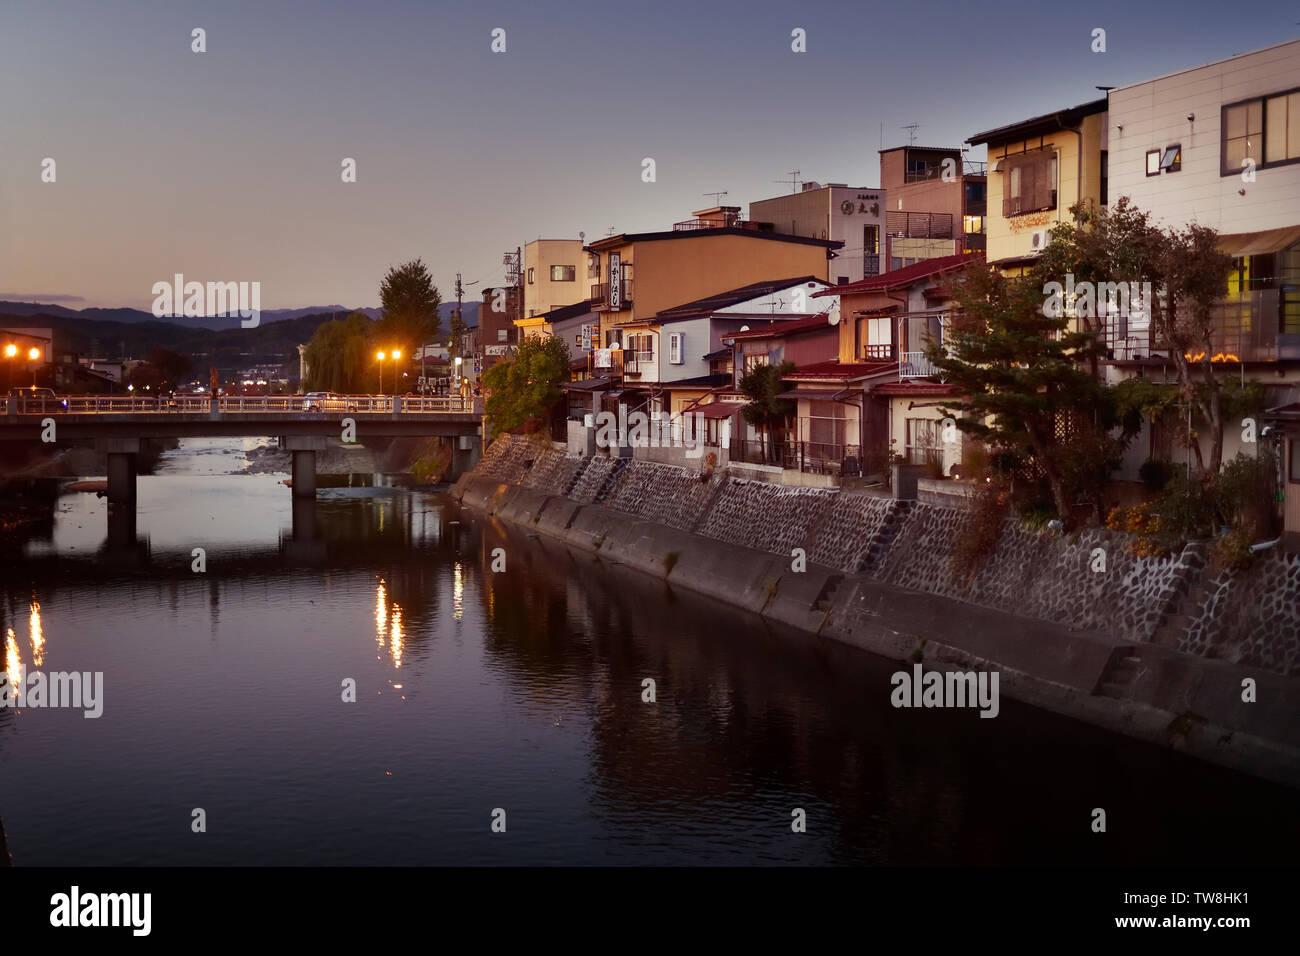 Row of houses on a bank of Miyagawa river, Takayama in a sunset city scenery. Hida-Takayama, Gifu prefecture, Japan 2018. - Stock Image